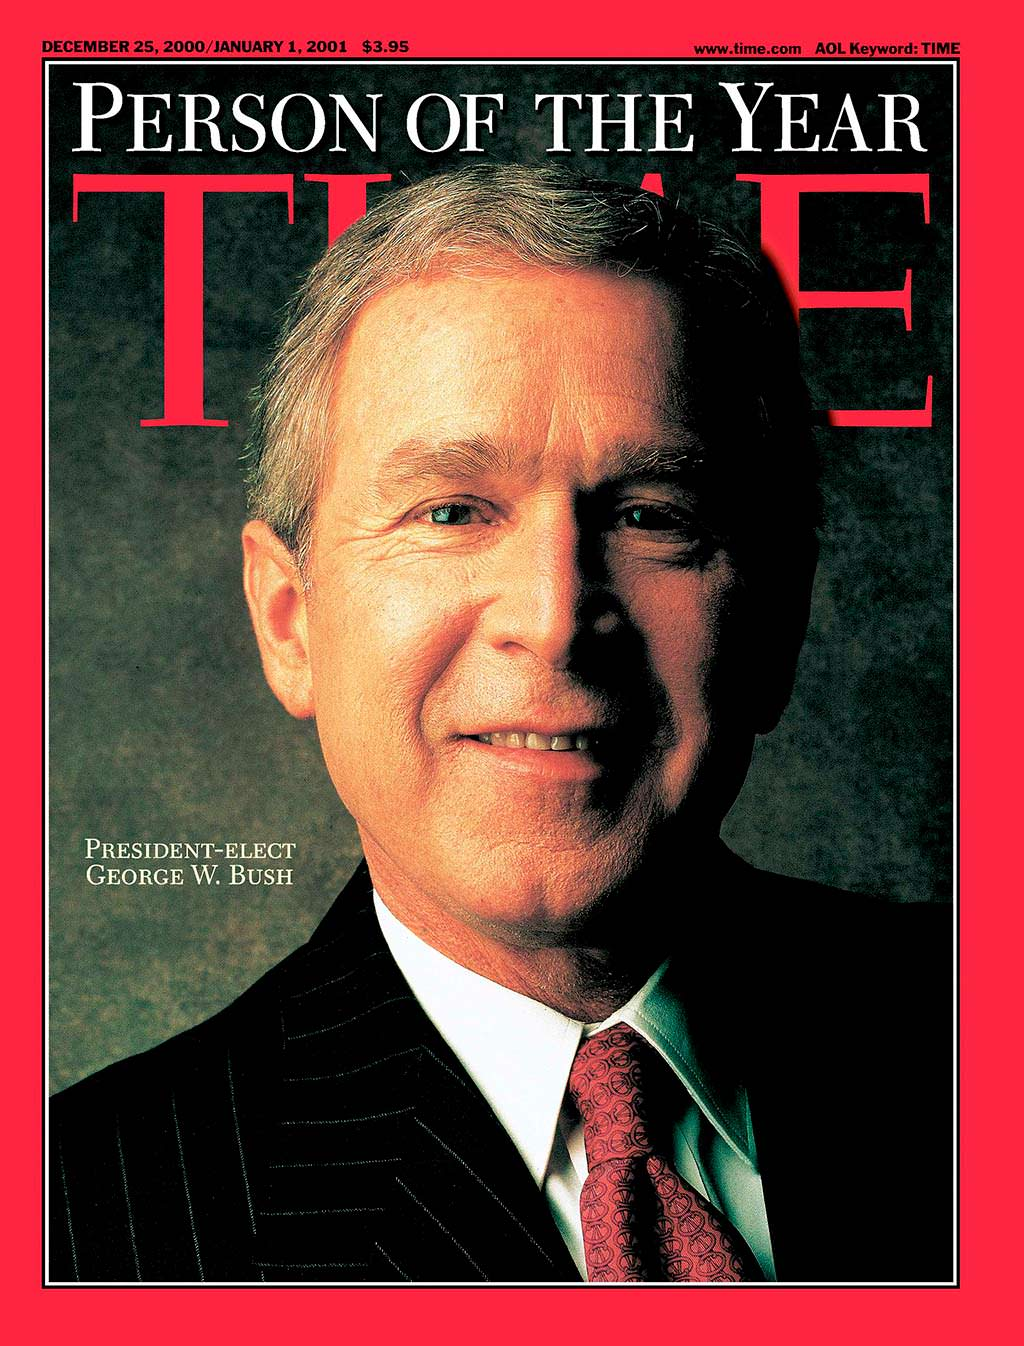 2000 год. 43-й президент США Джордж Буш-младший на обложке Time